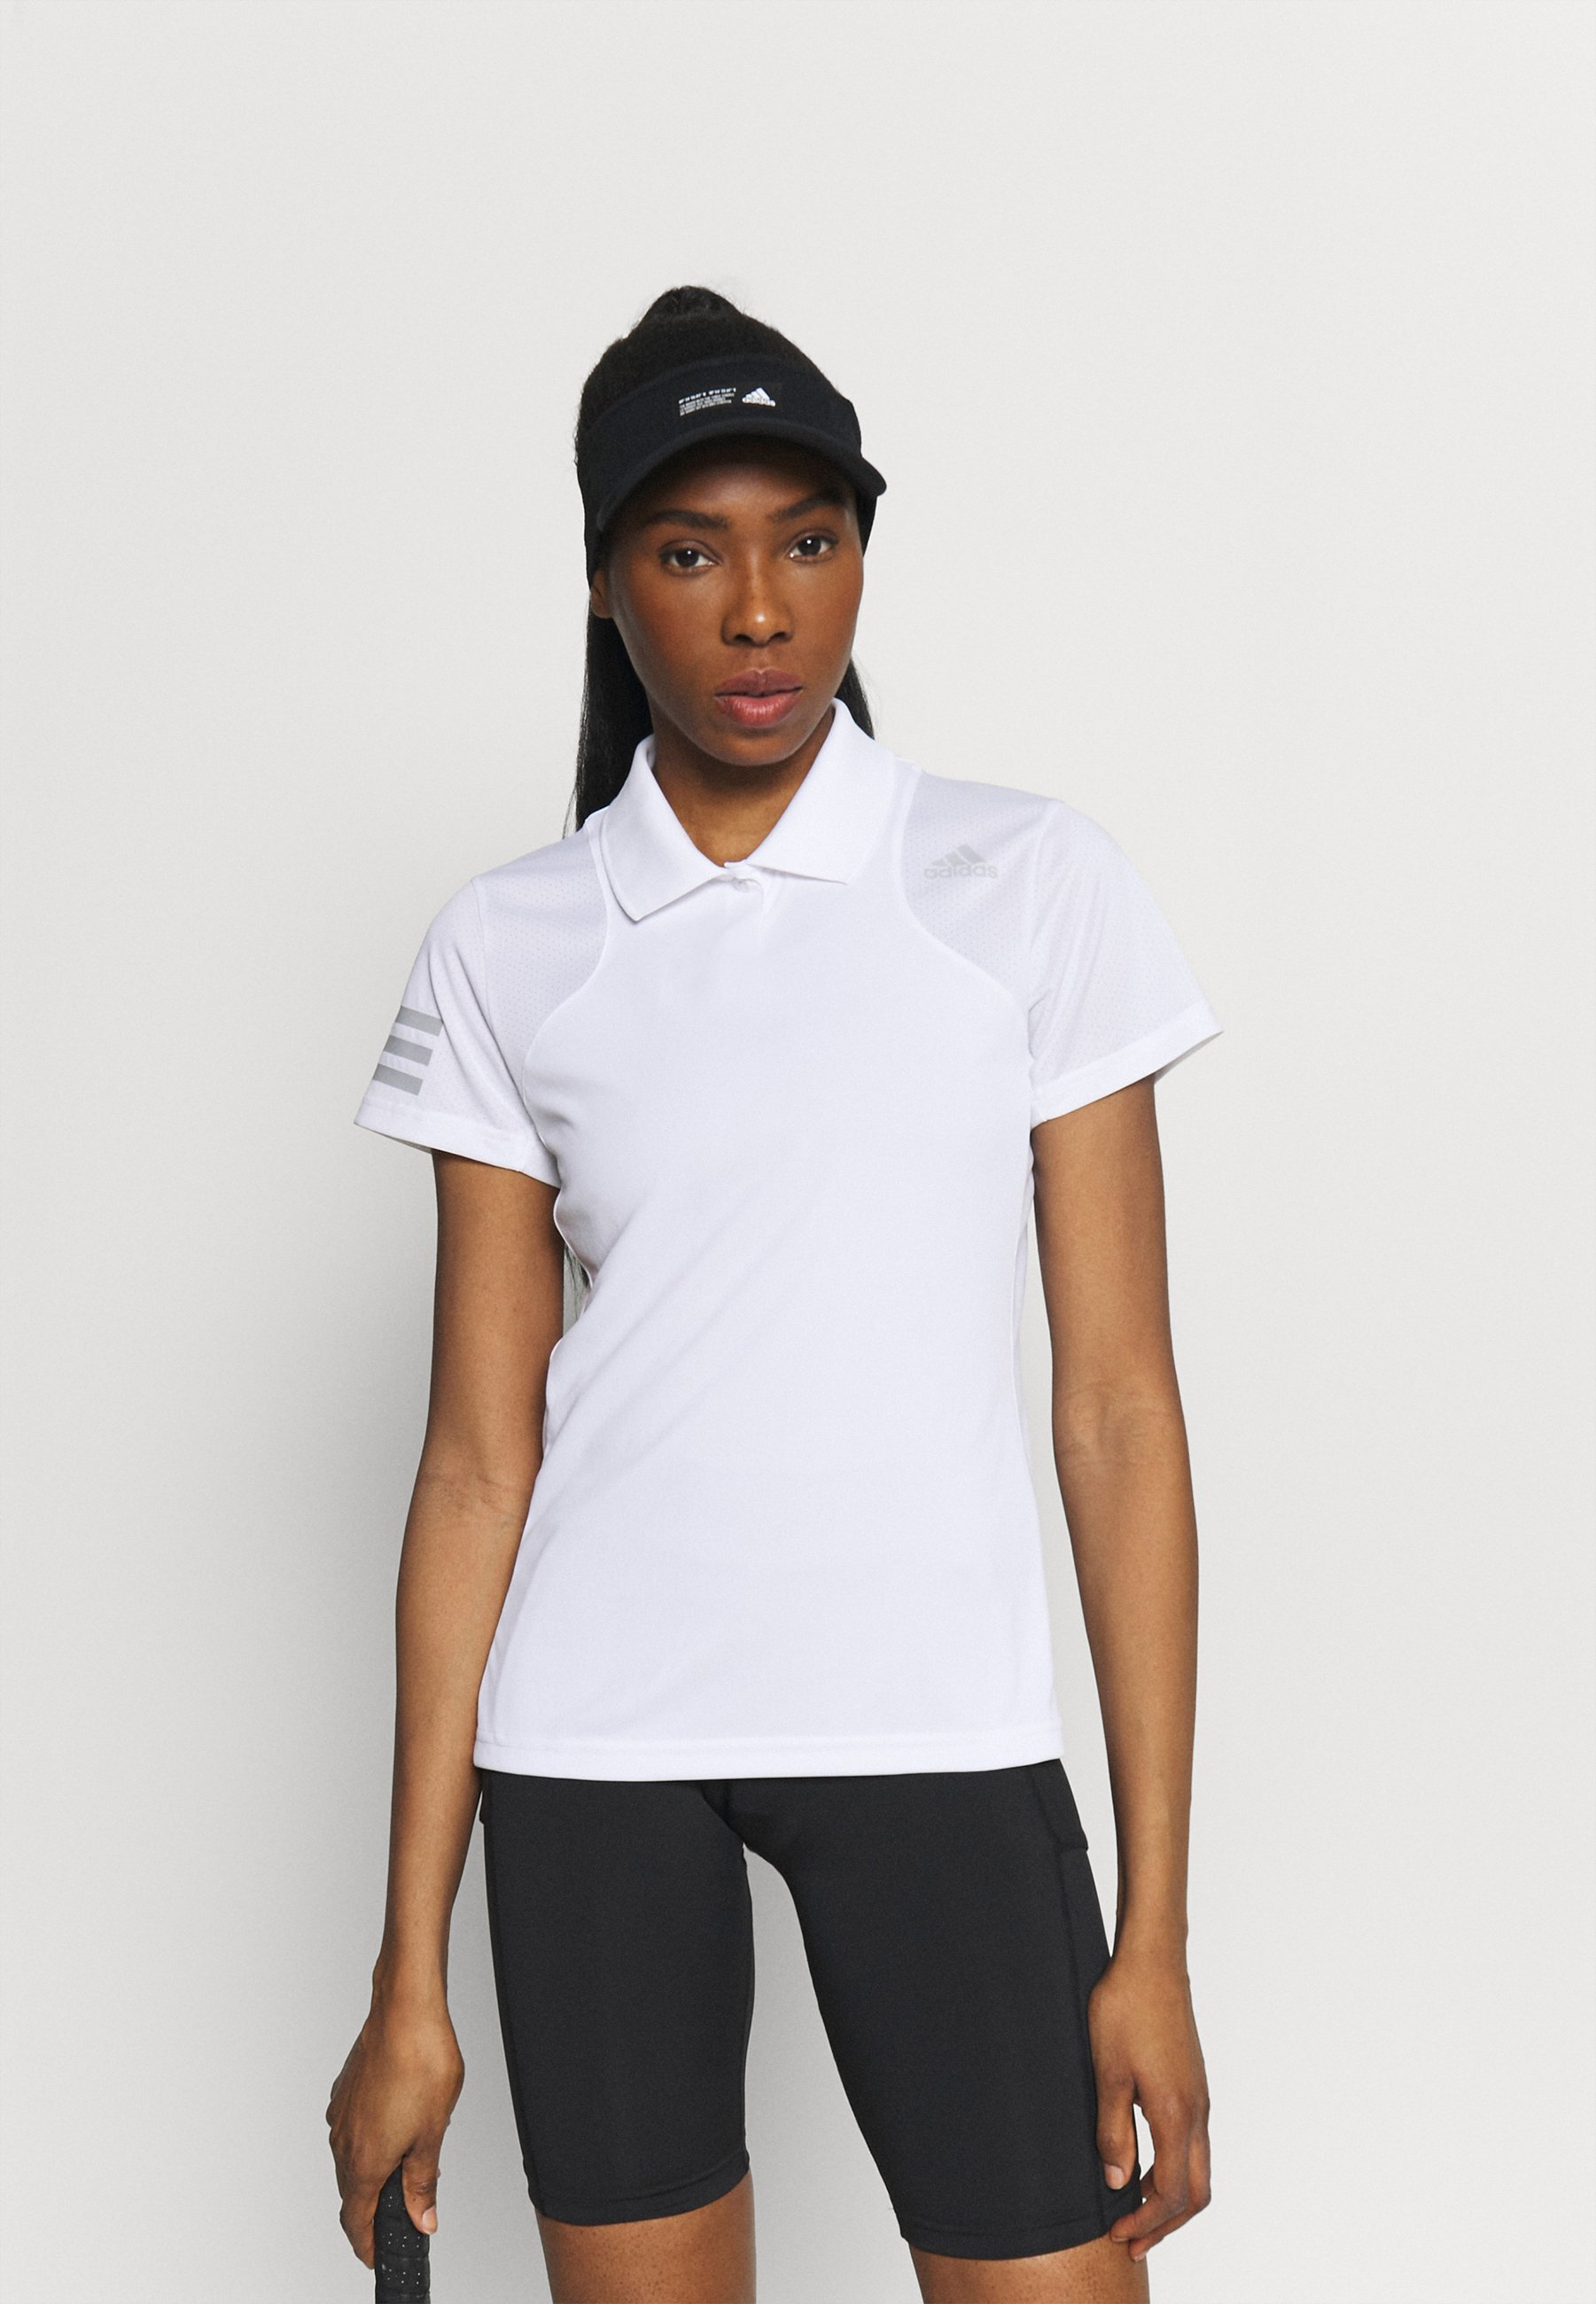 Femme CLUB TENNIS AEROREADY - T-shirt de sport